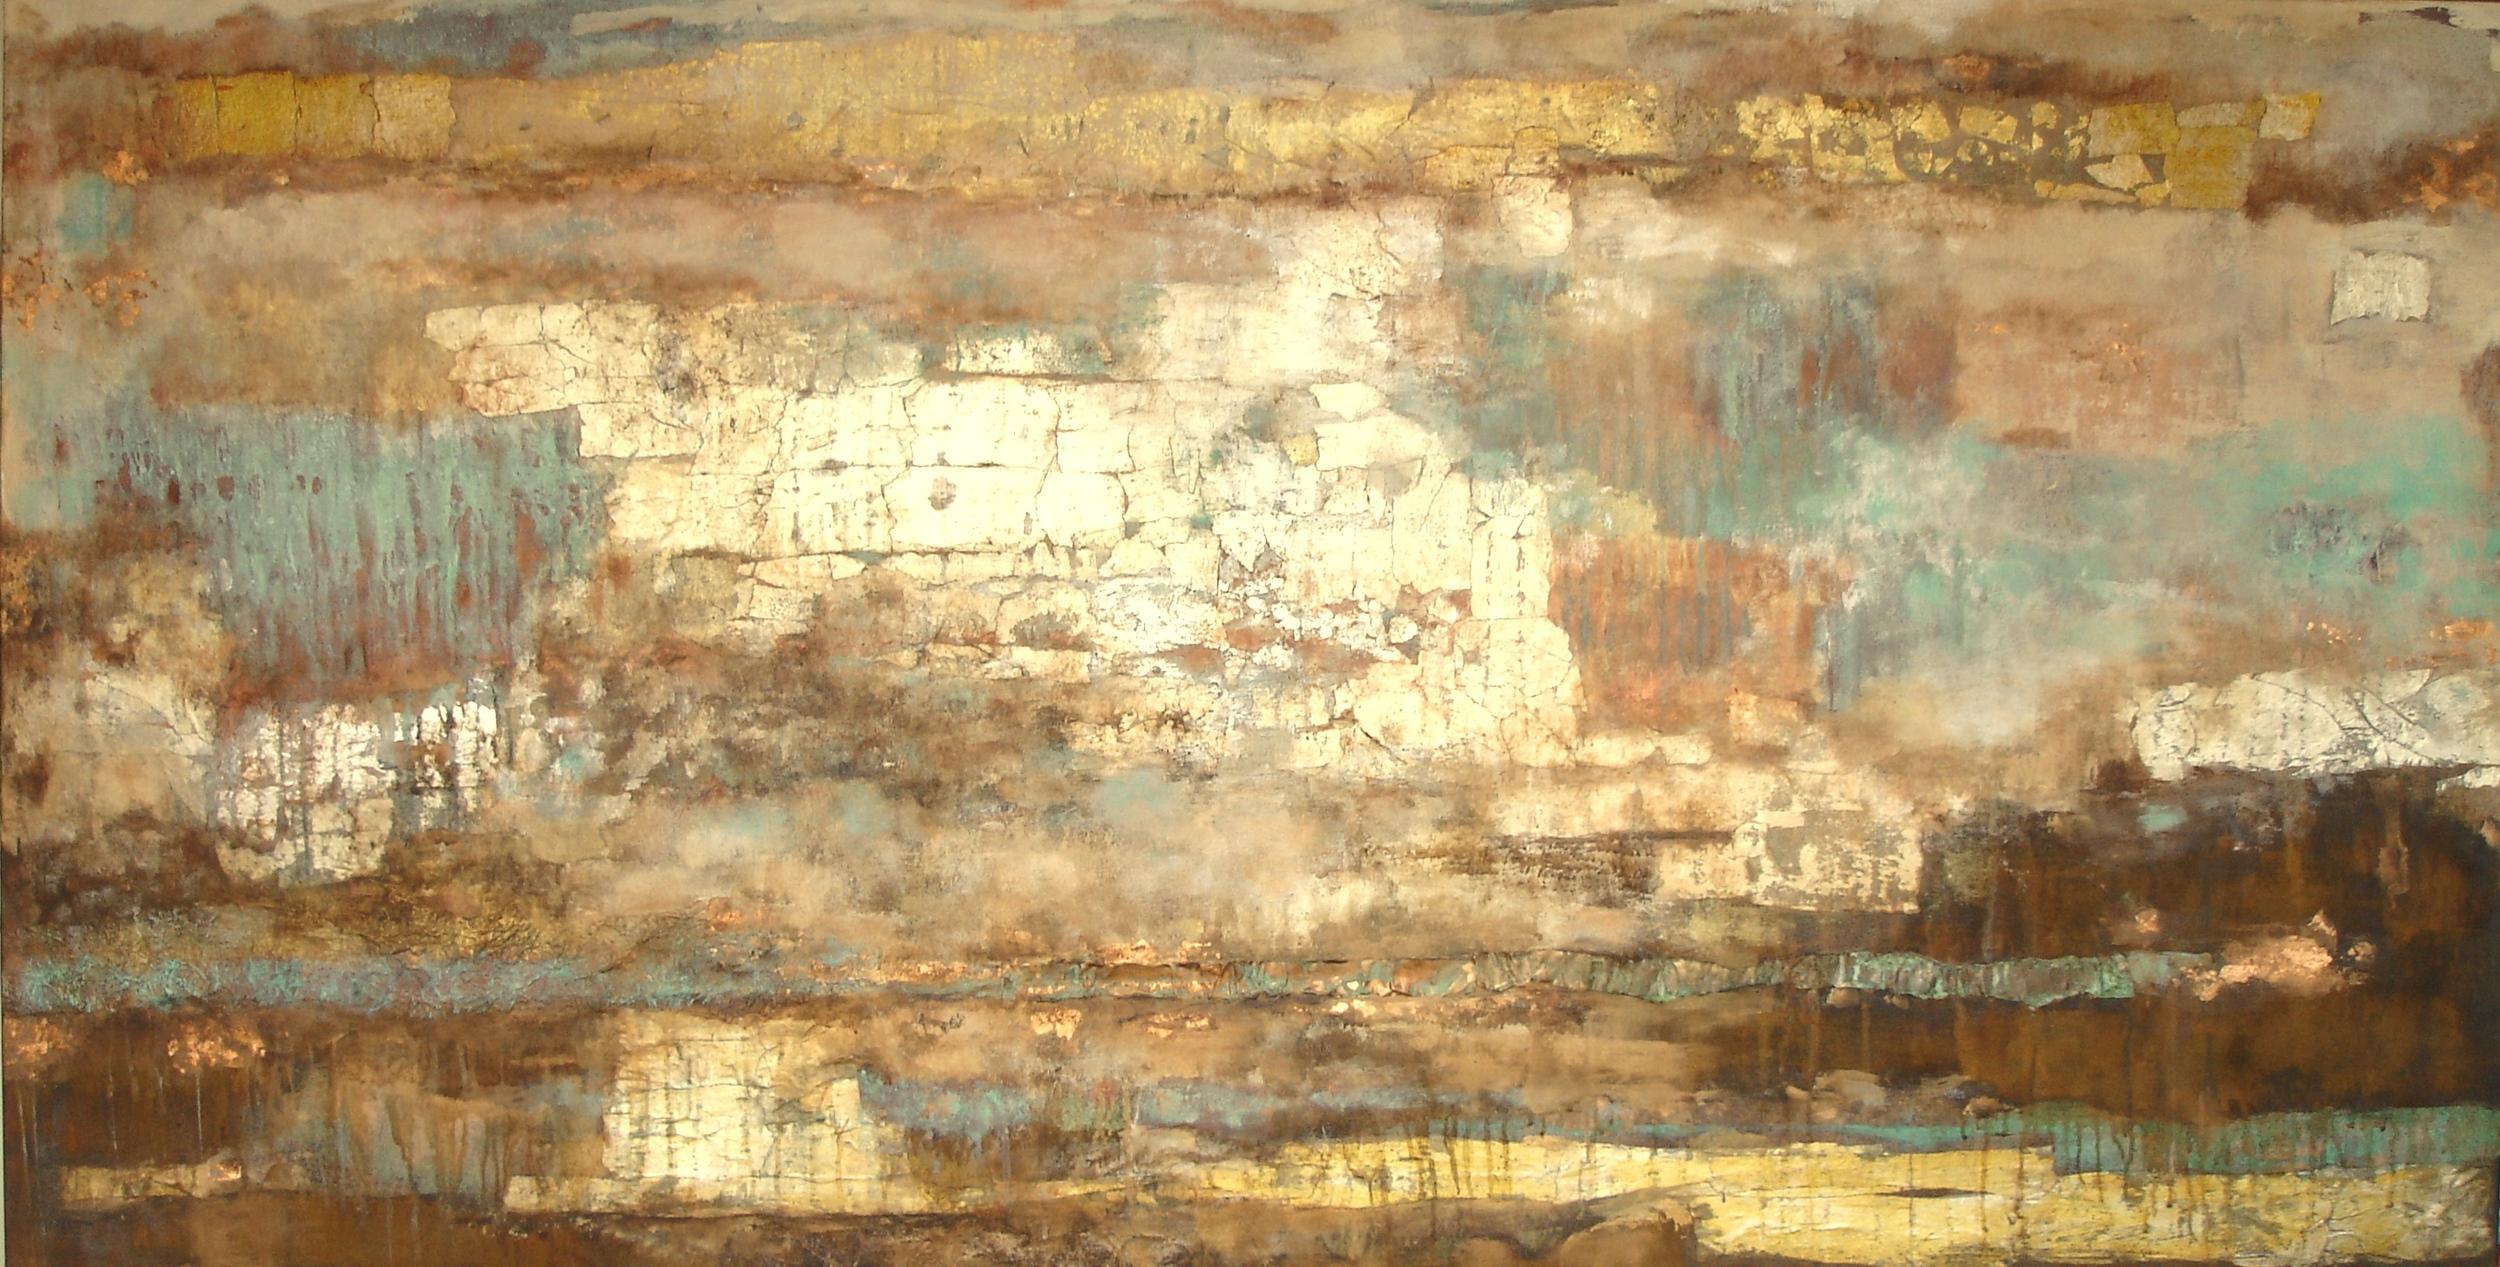 Rustic Shores 198 x 102 cm